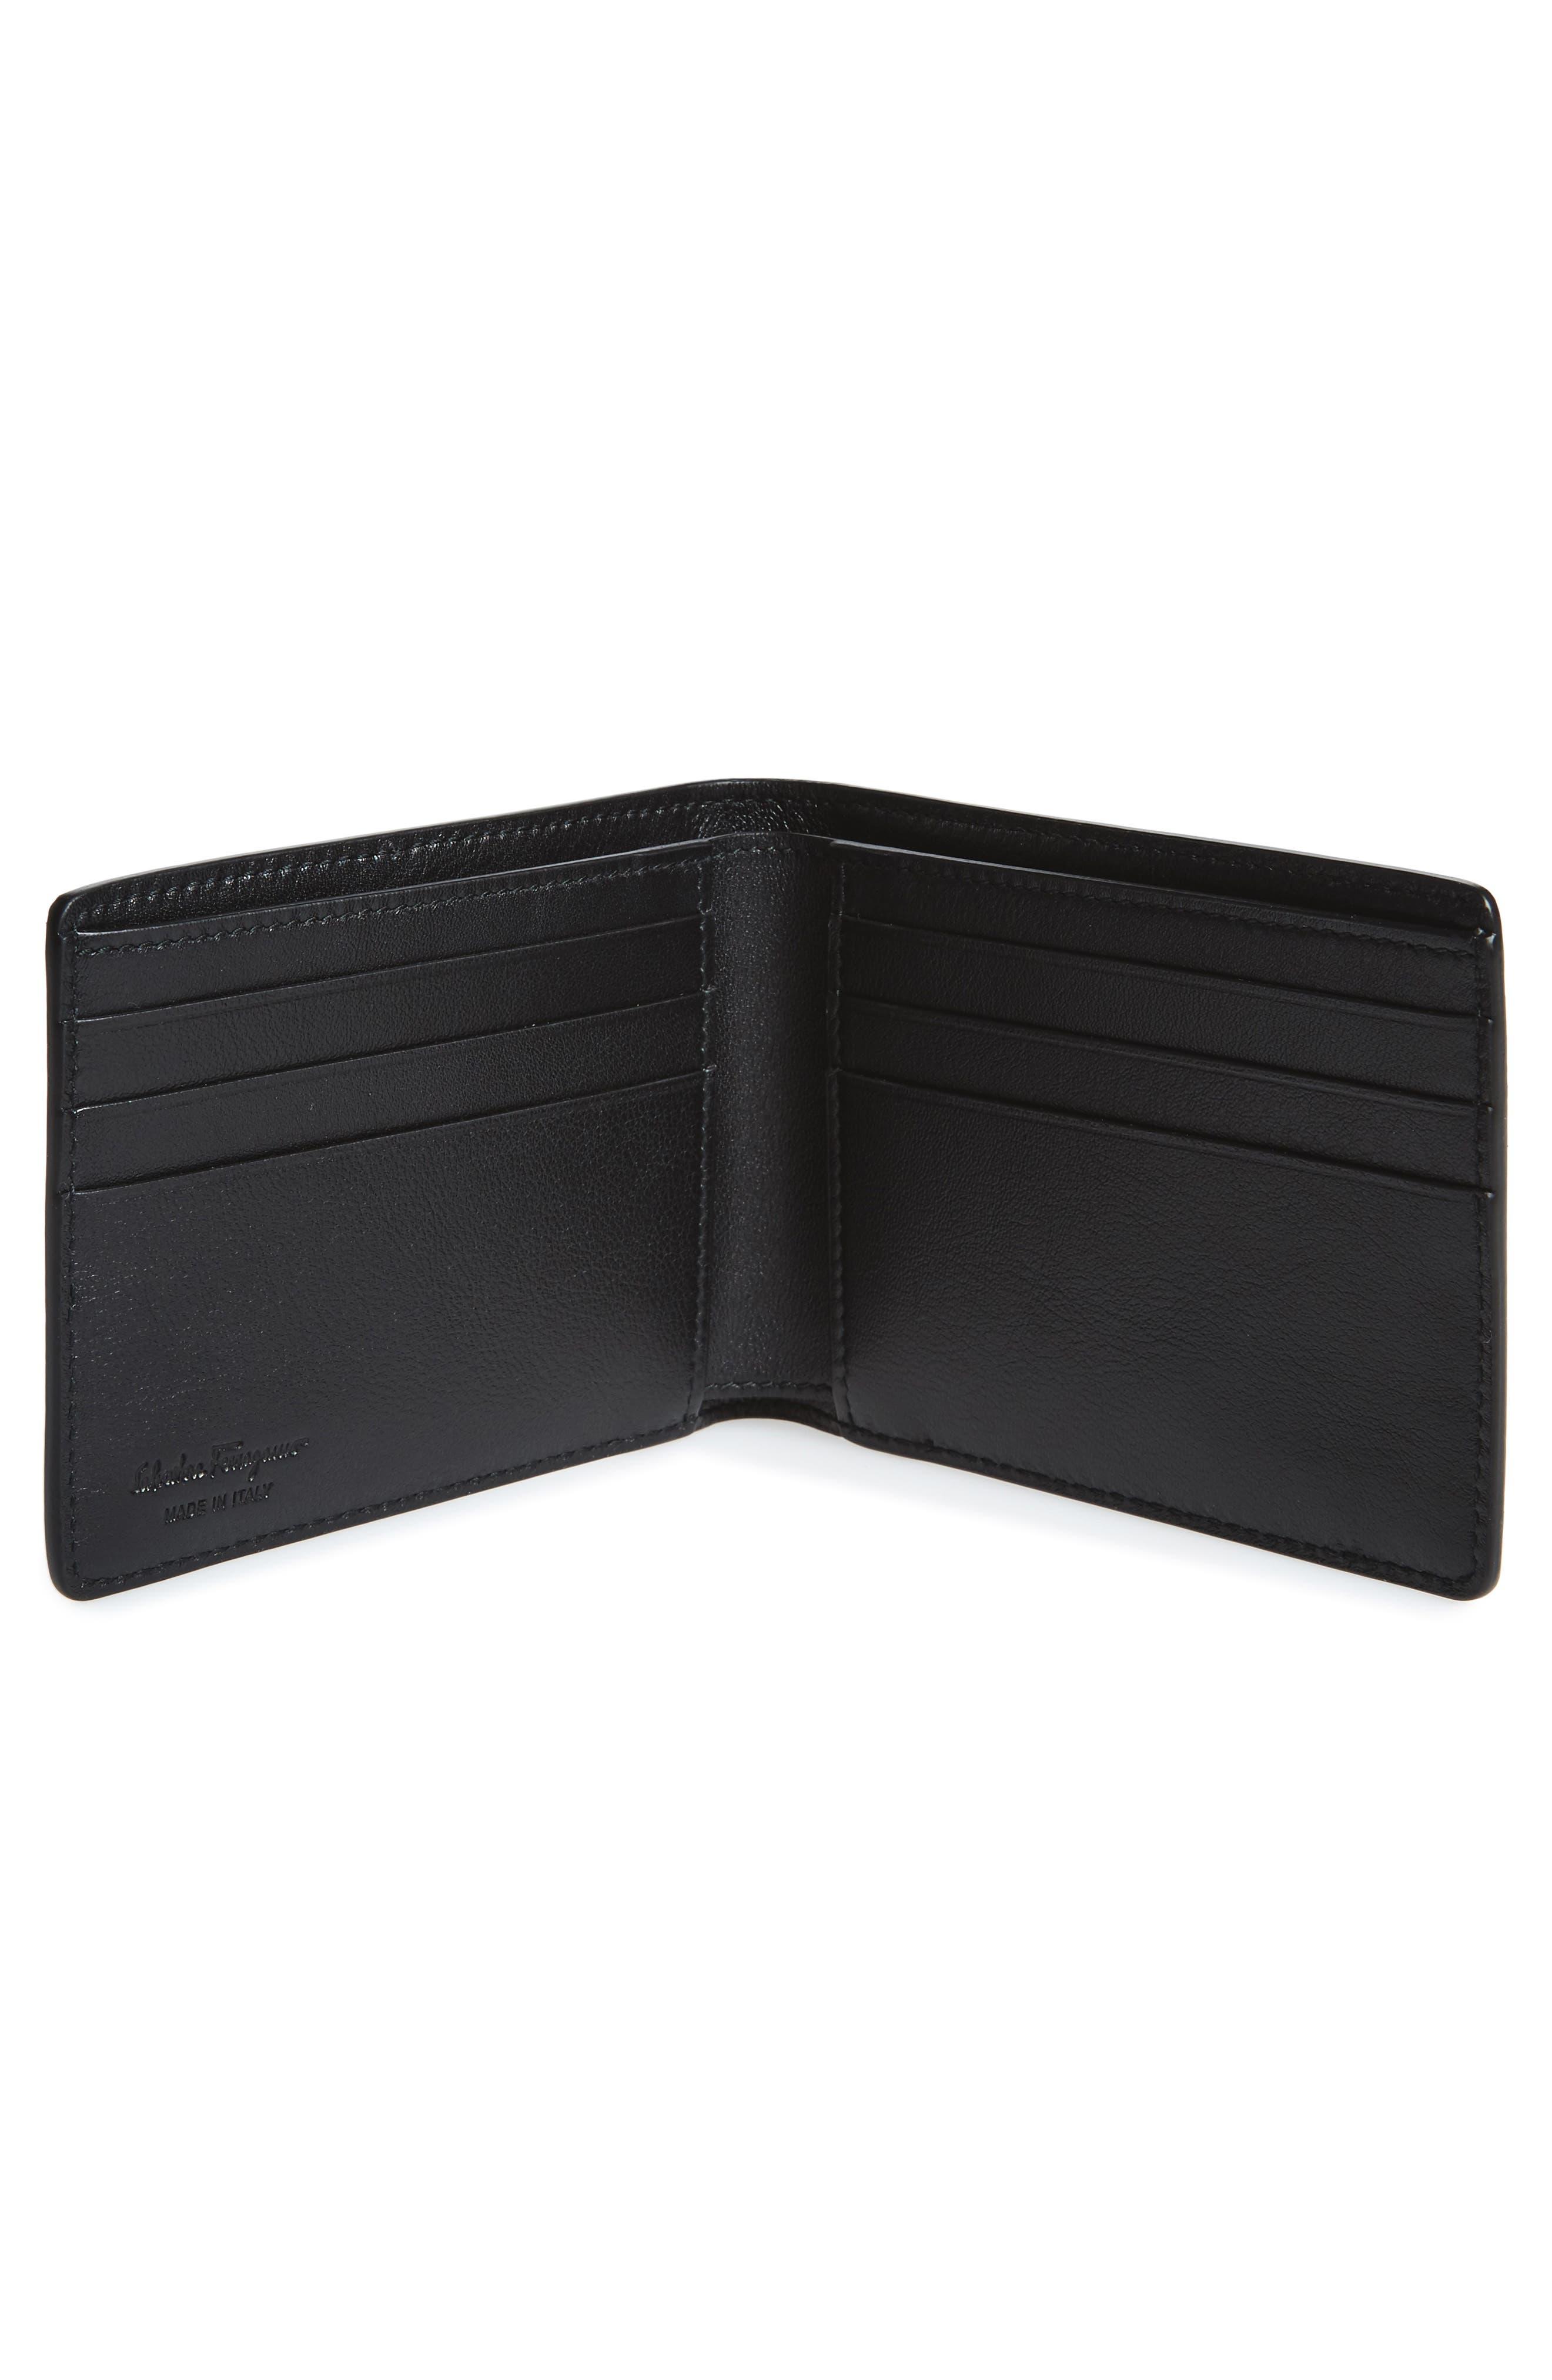 Revival Leather Wallet,                             Alternate thumbnail 2, color,                             462